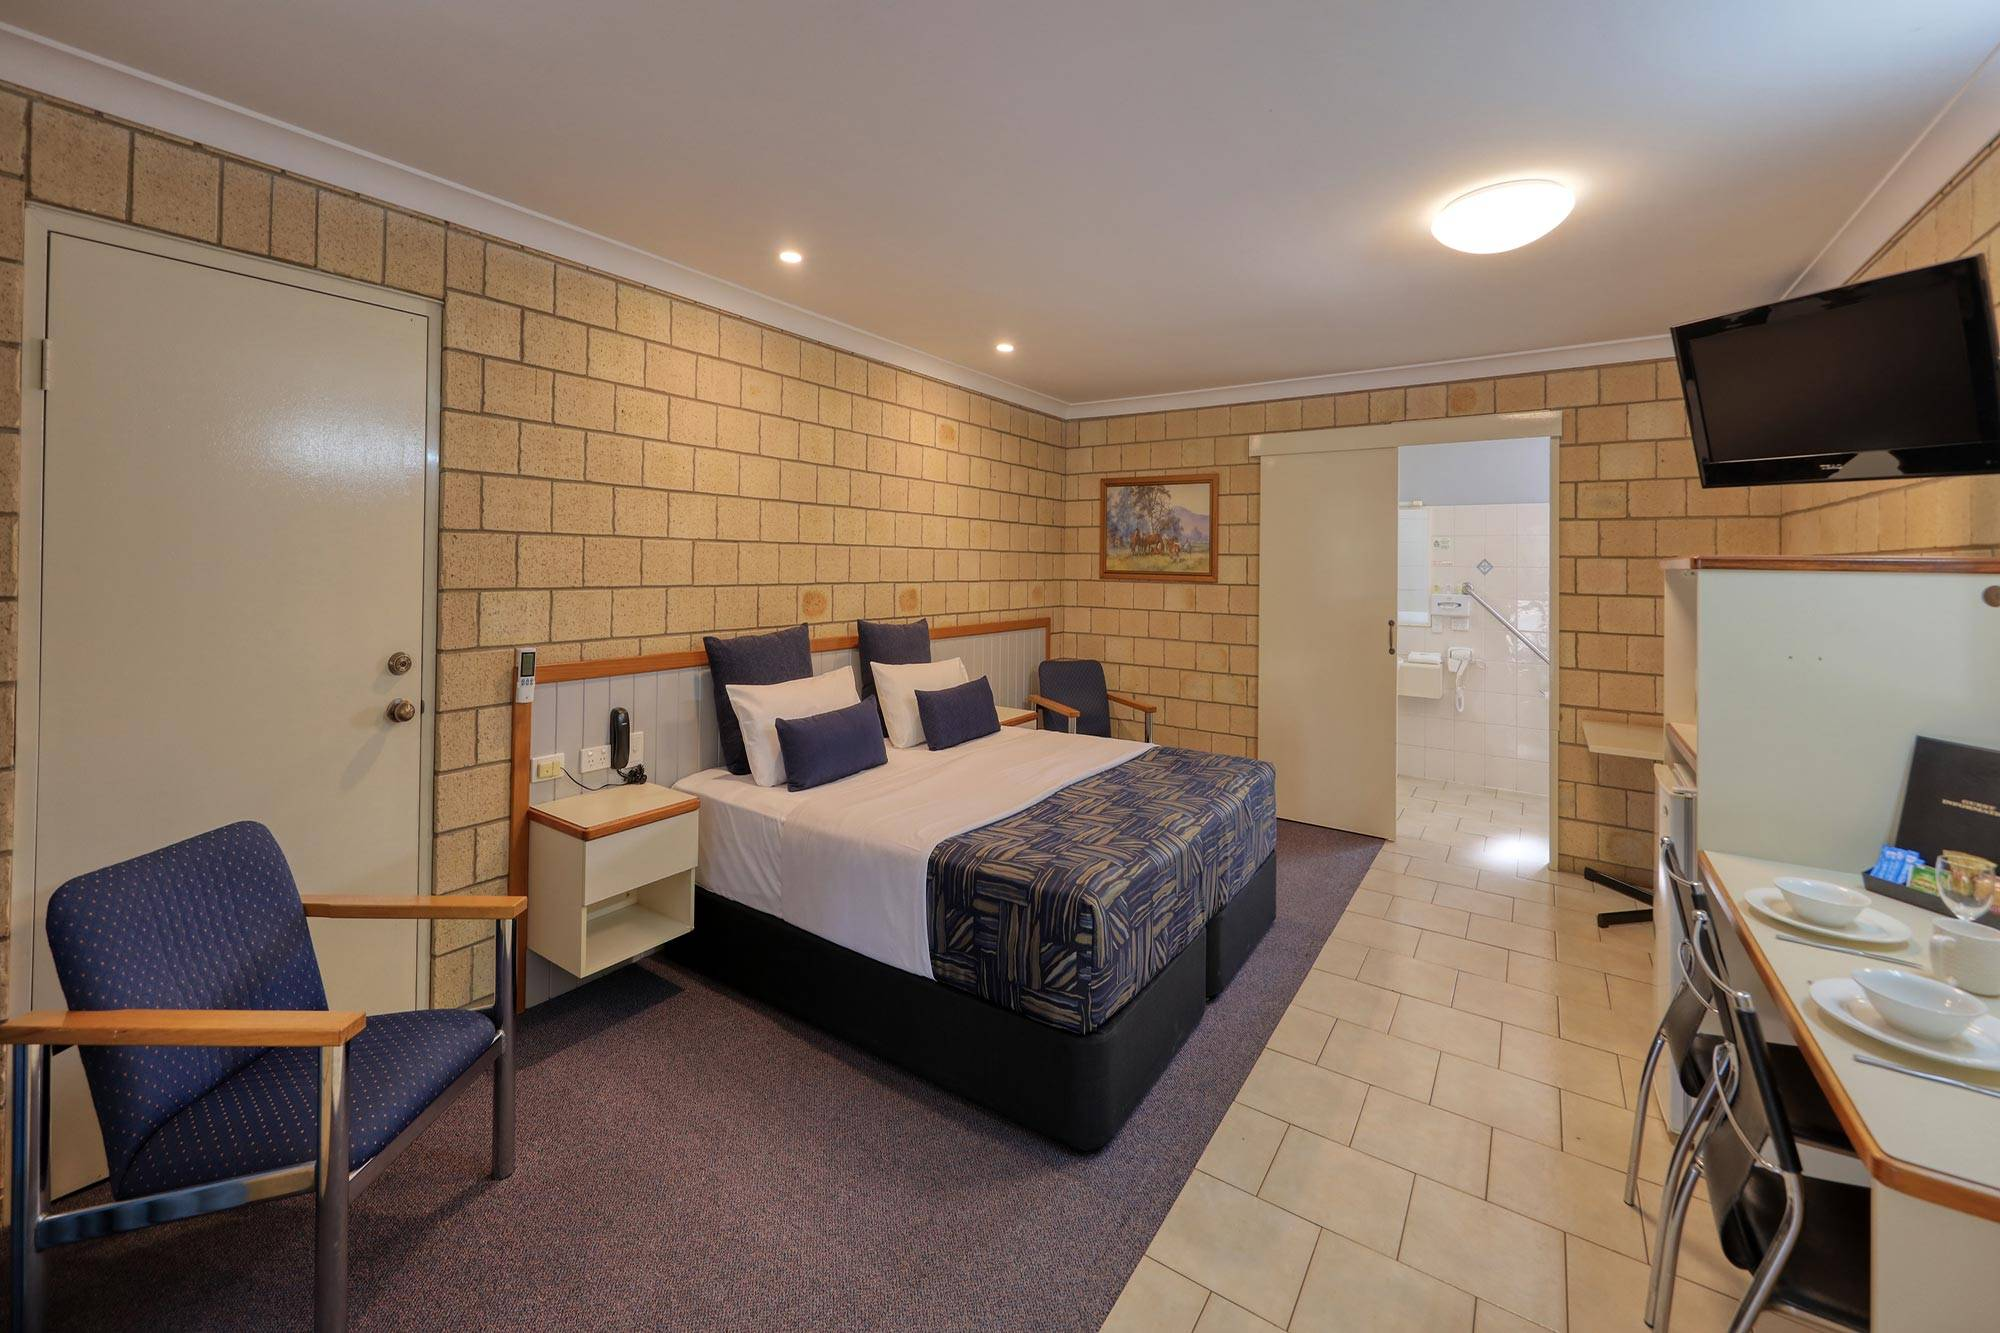 st-george-motel-disabled-king-room (1)